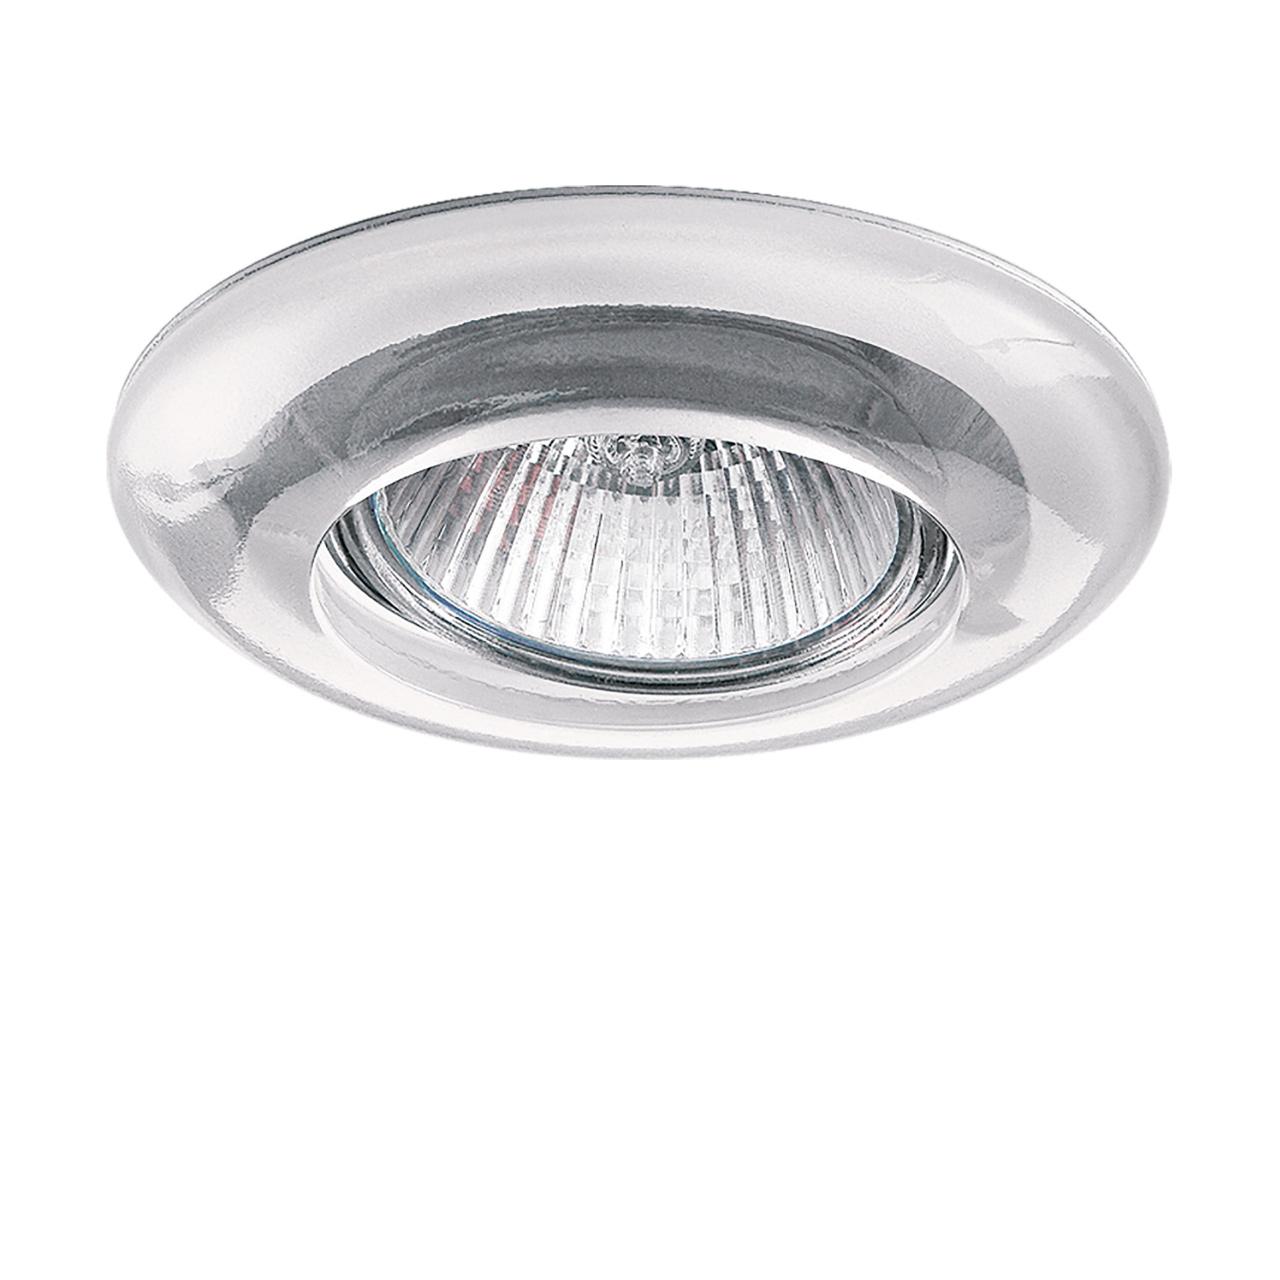 Светильник Anello TR MR16 / HP16 хром / прозрачный Lightstar 002230